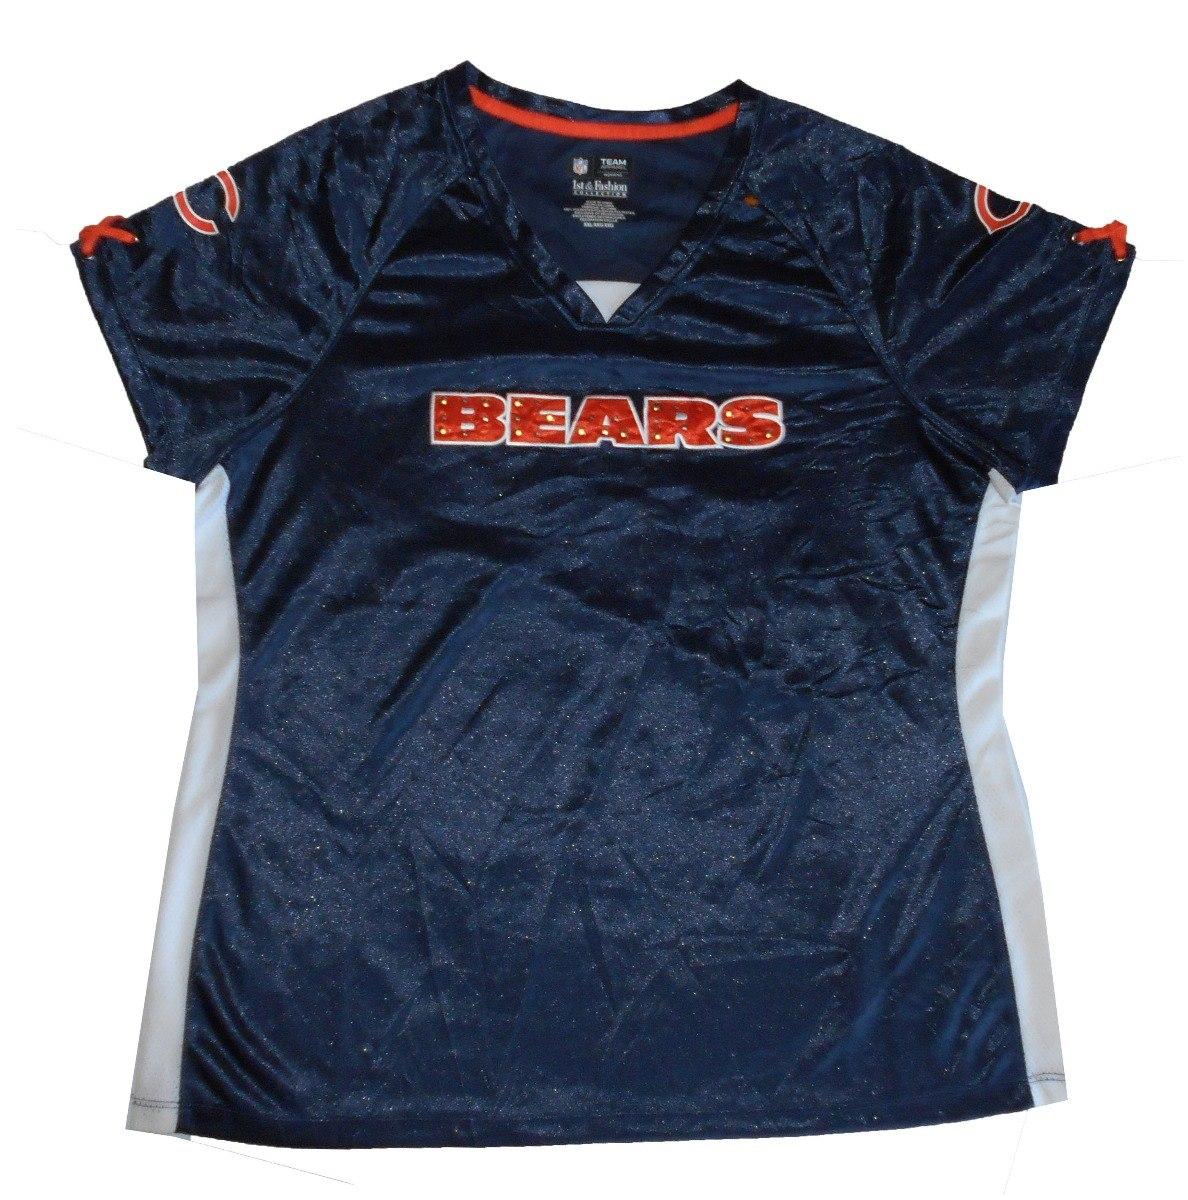 852dcdfe593fd Camiseta De Nfl - Xxl - Chicago Bears (juvenil mujer) - Plz -   690 ...